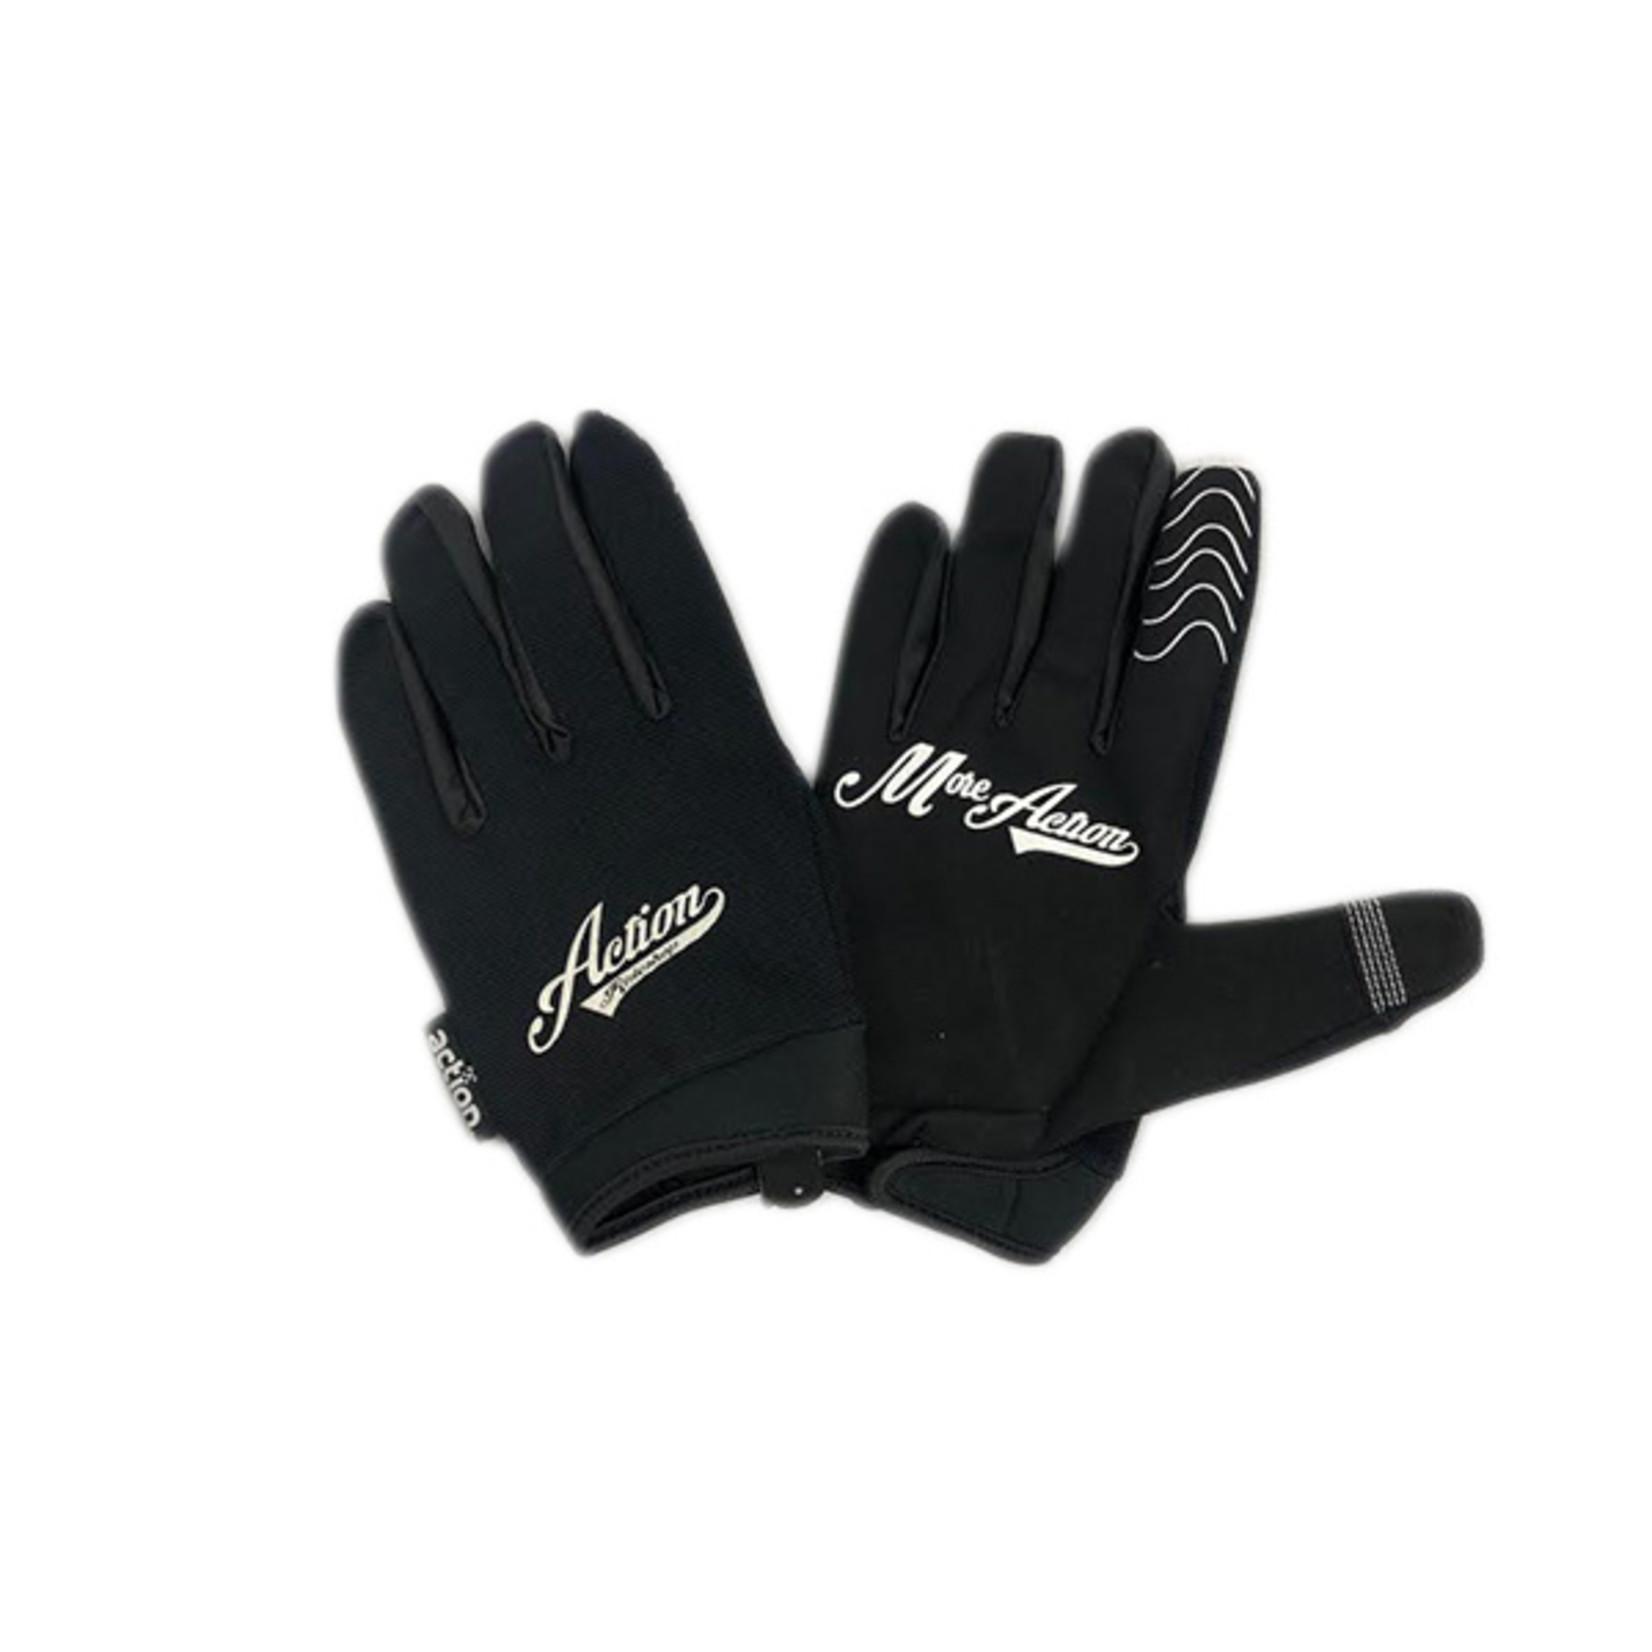 Action Rideshop Classic Glove